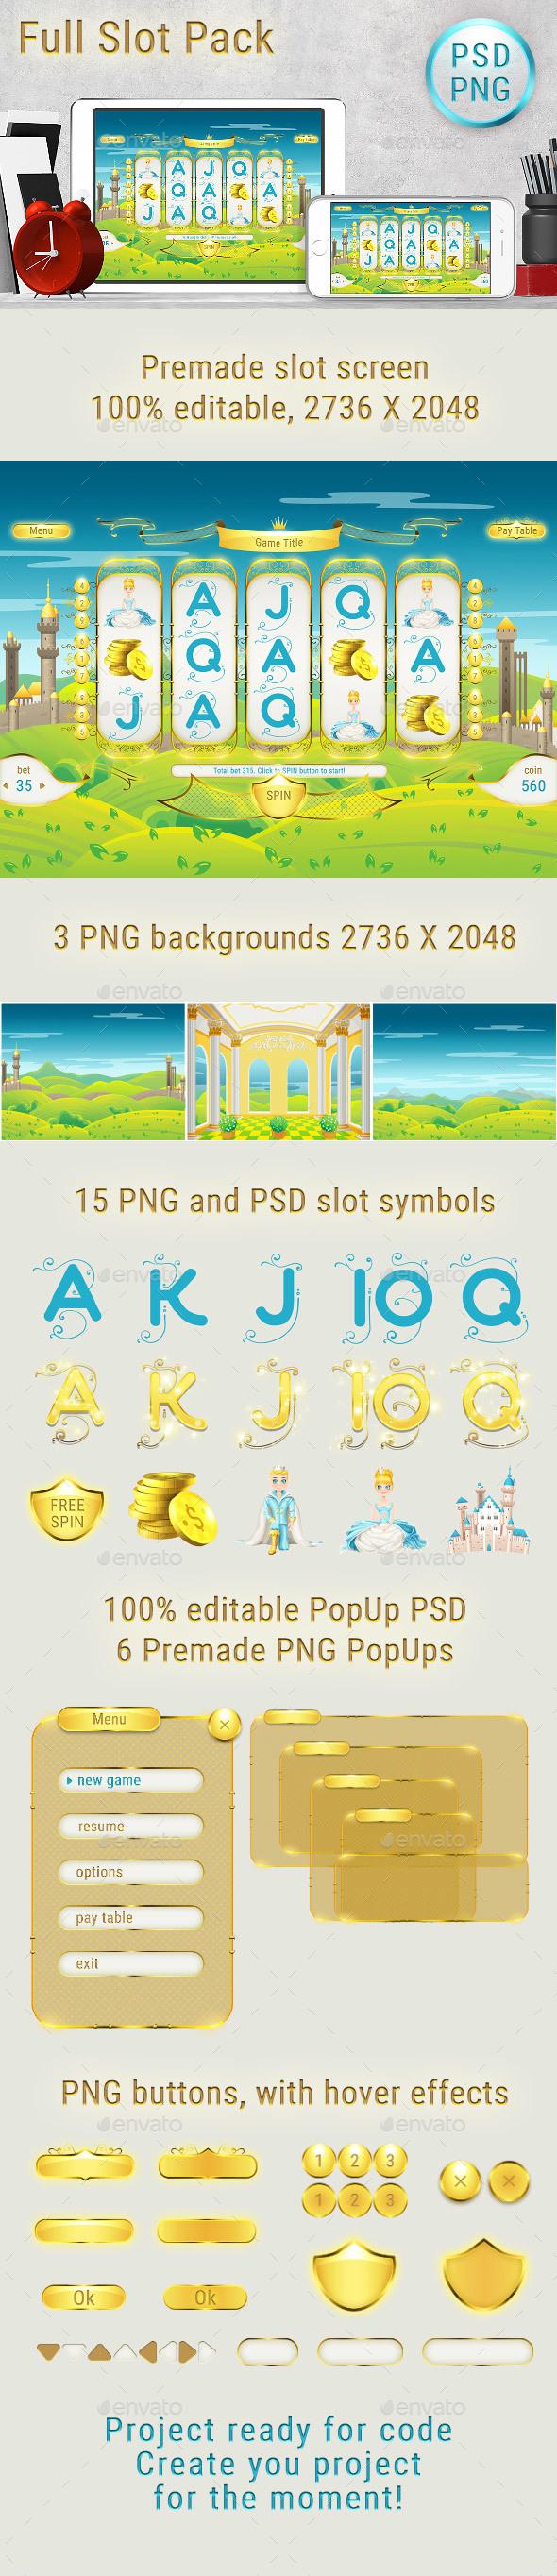 Royal Slot UI Pack Preview - Game Kits Game Assets